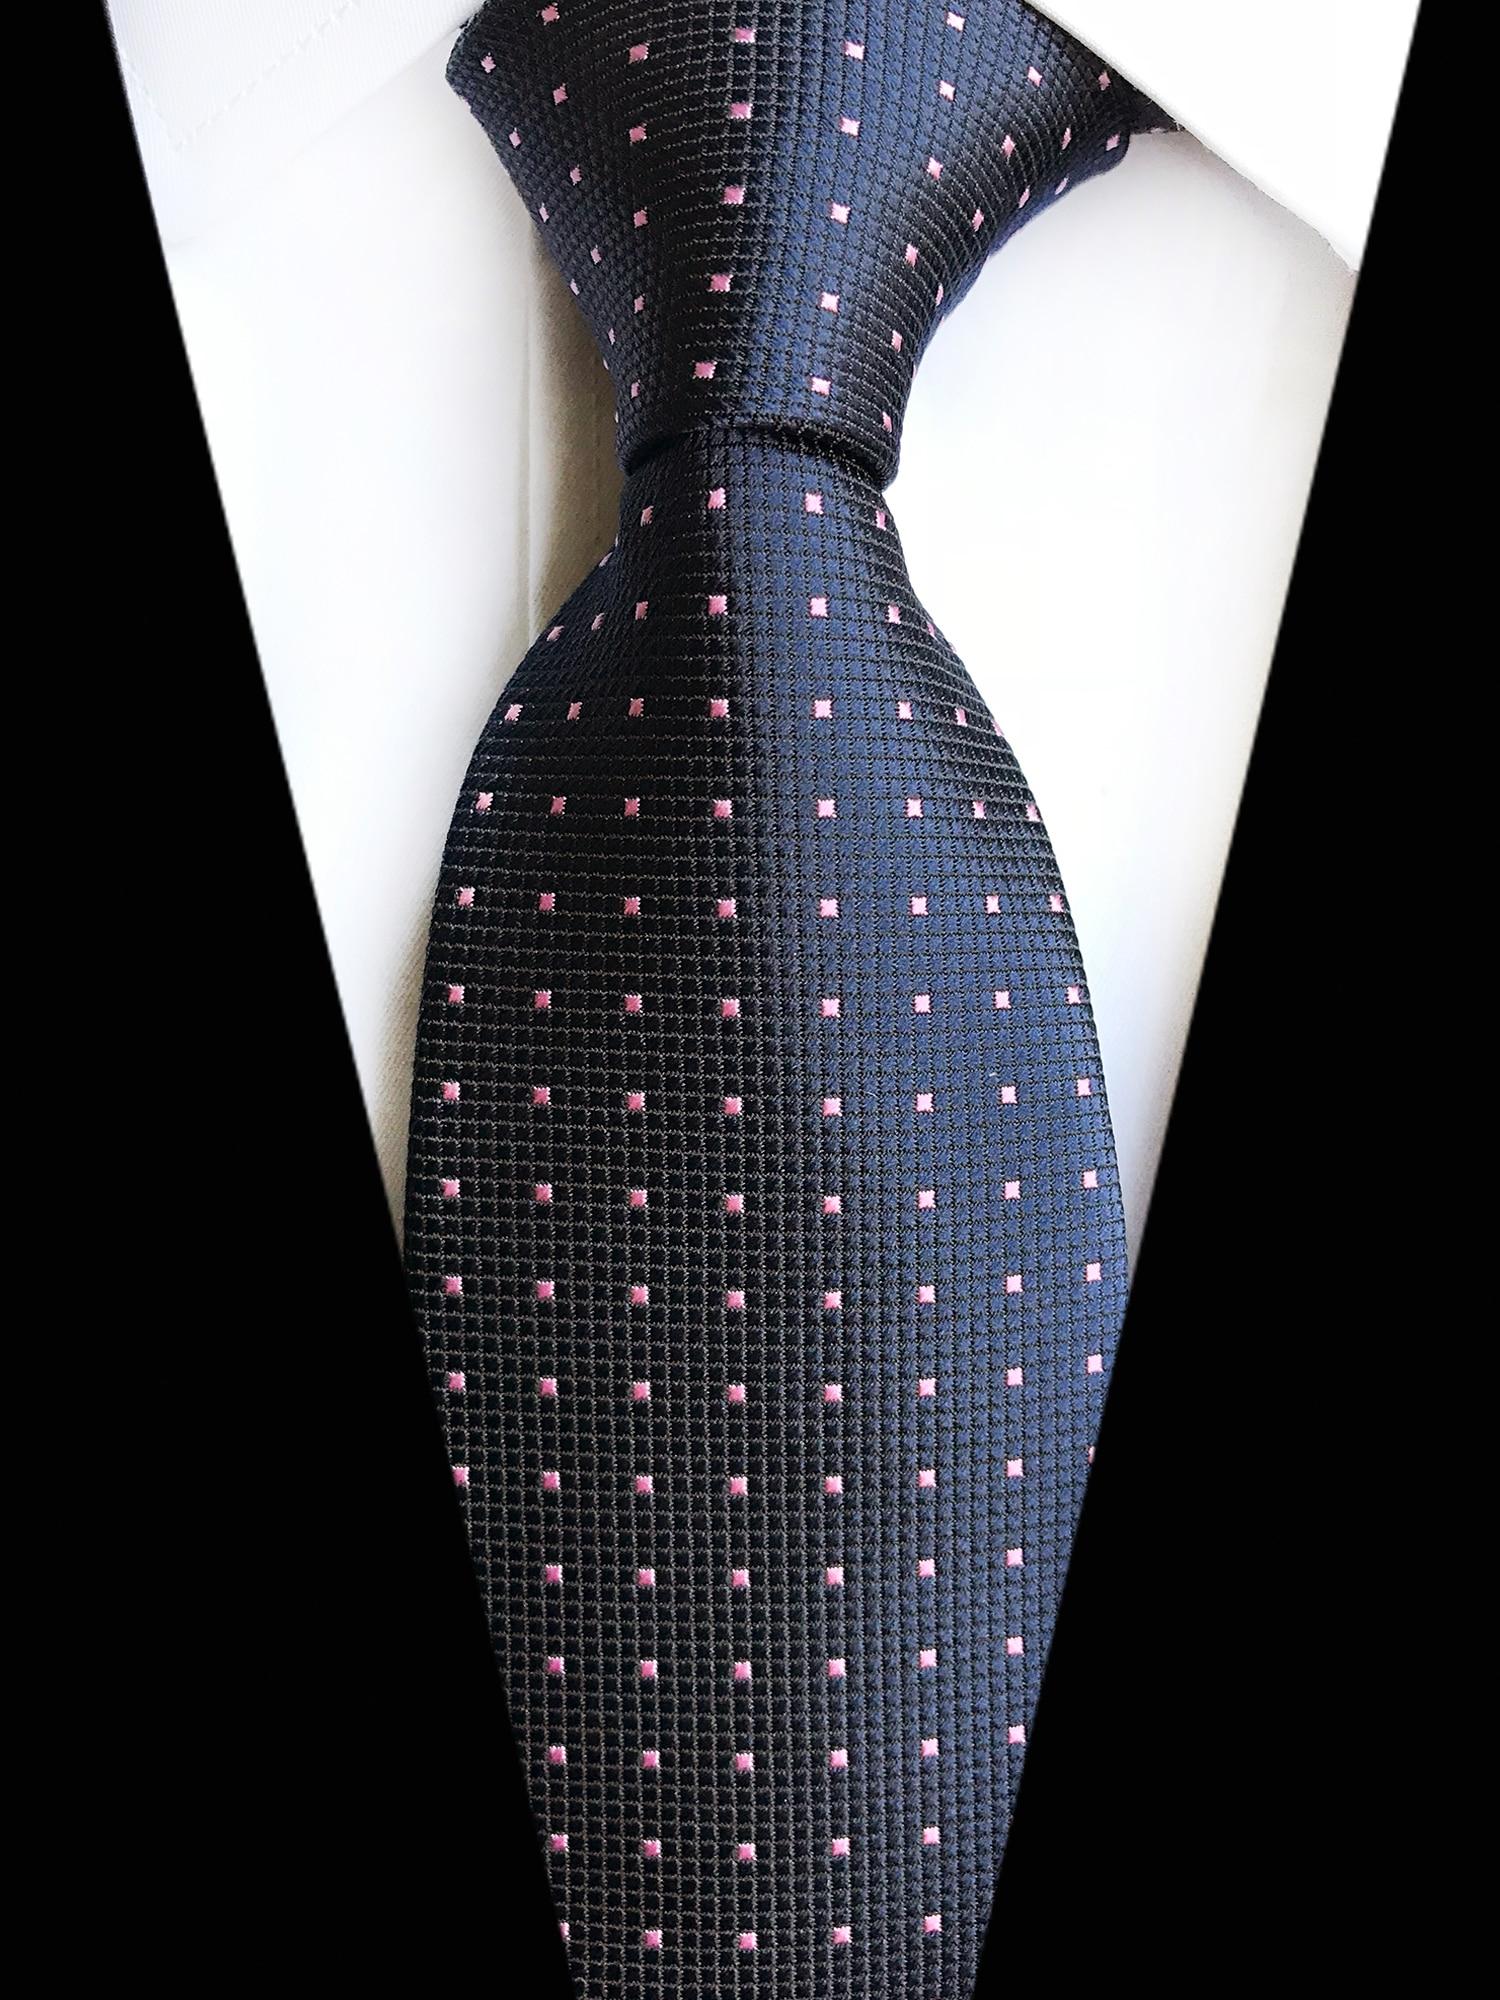 8CM Classy Men Woven Tie Male Gentlemen Fashion Blue Necktie With Pink Dots Cravat